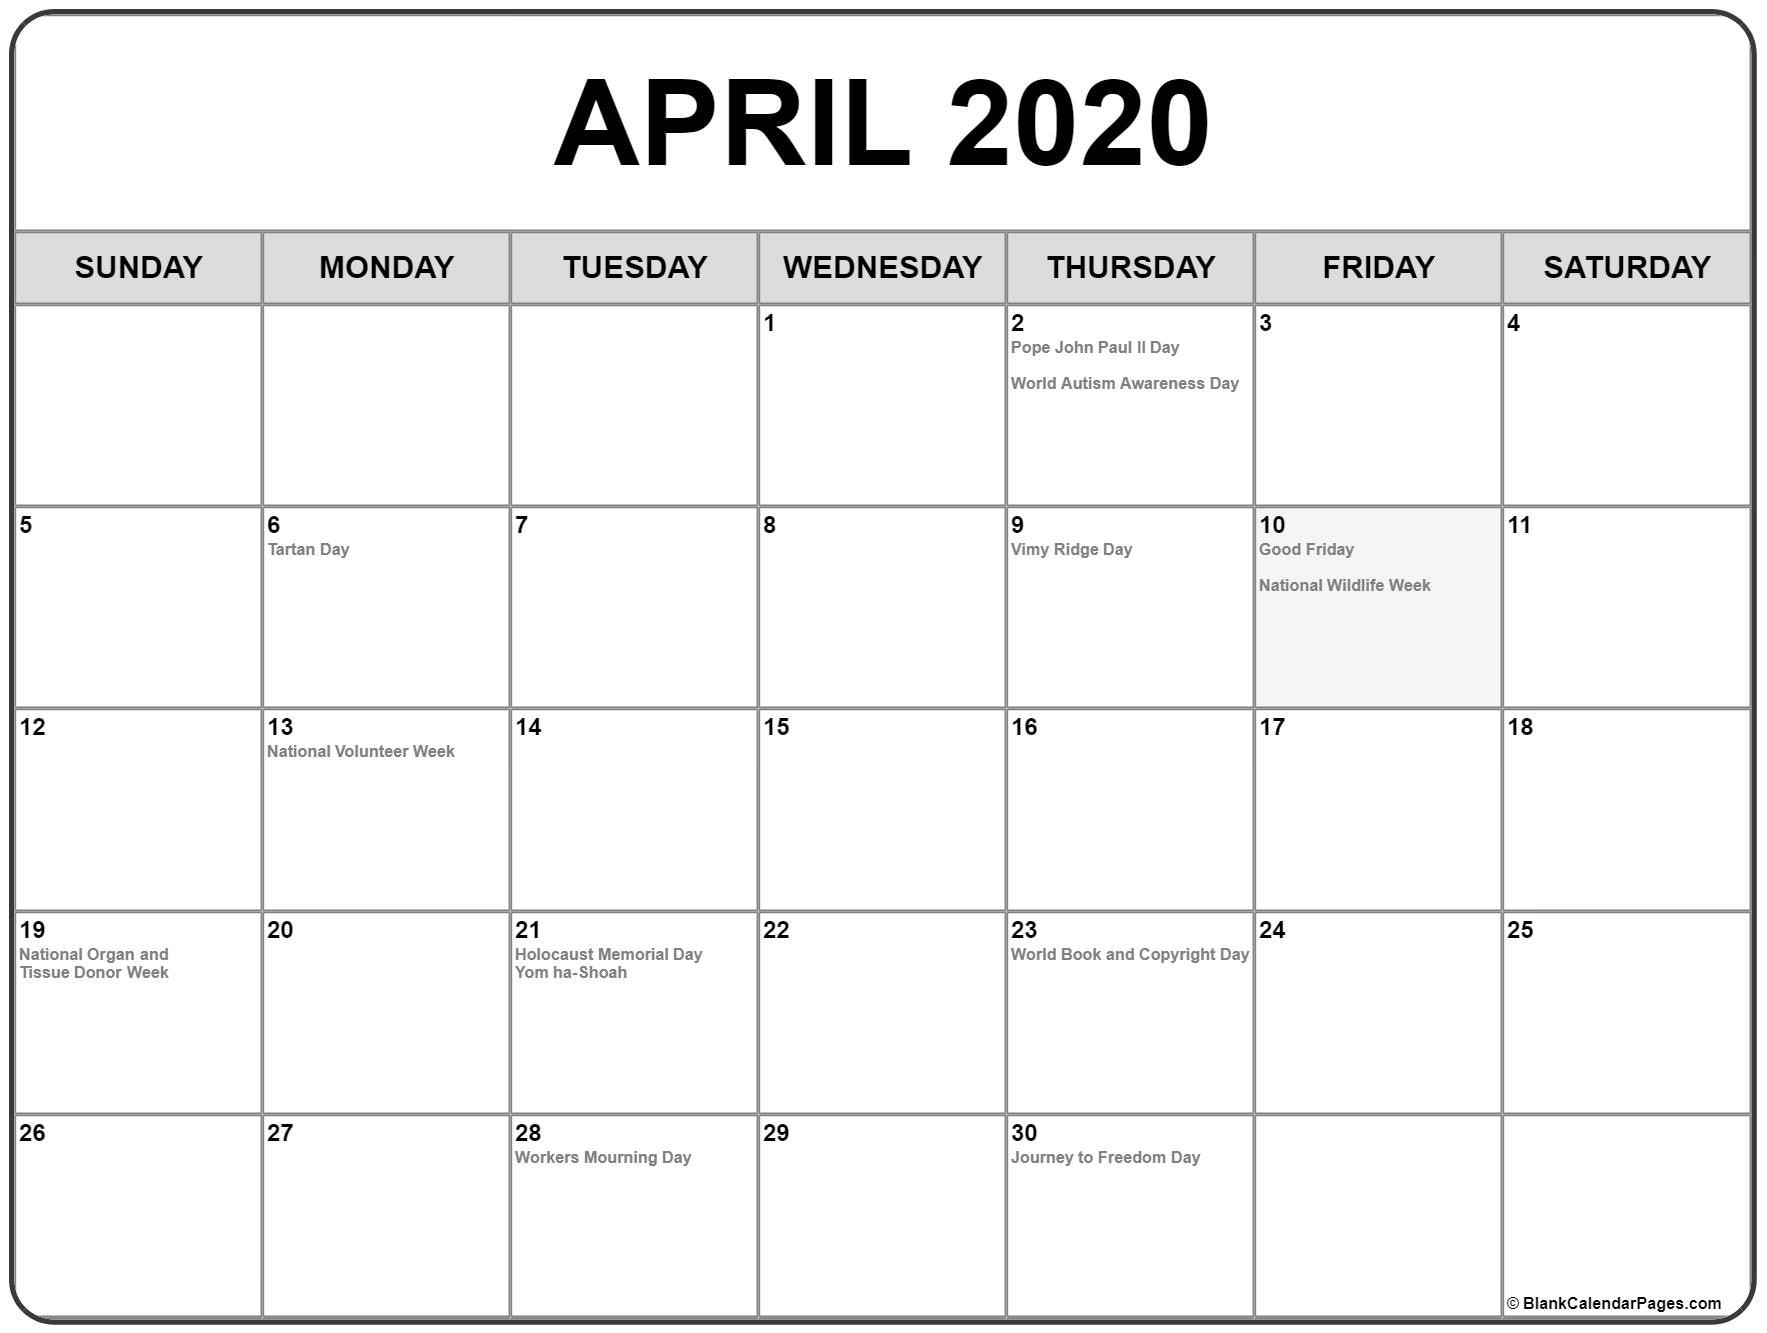 Calendar April 2020 Printable Collection Of April 2020 Calendars with Holidays